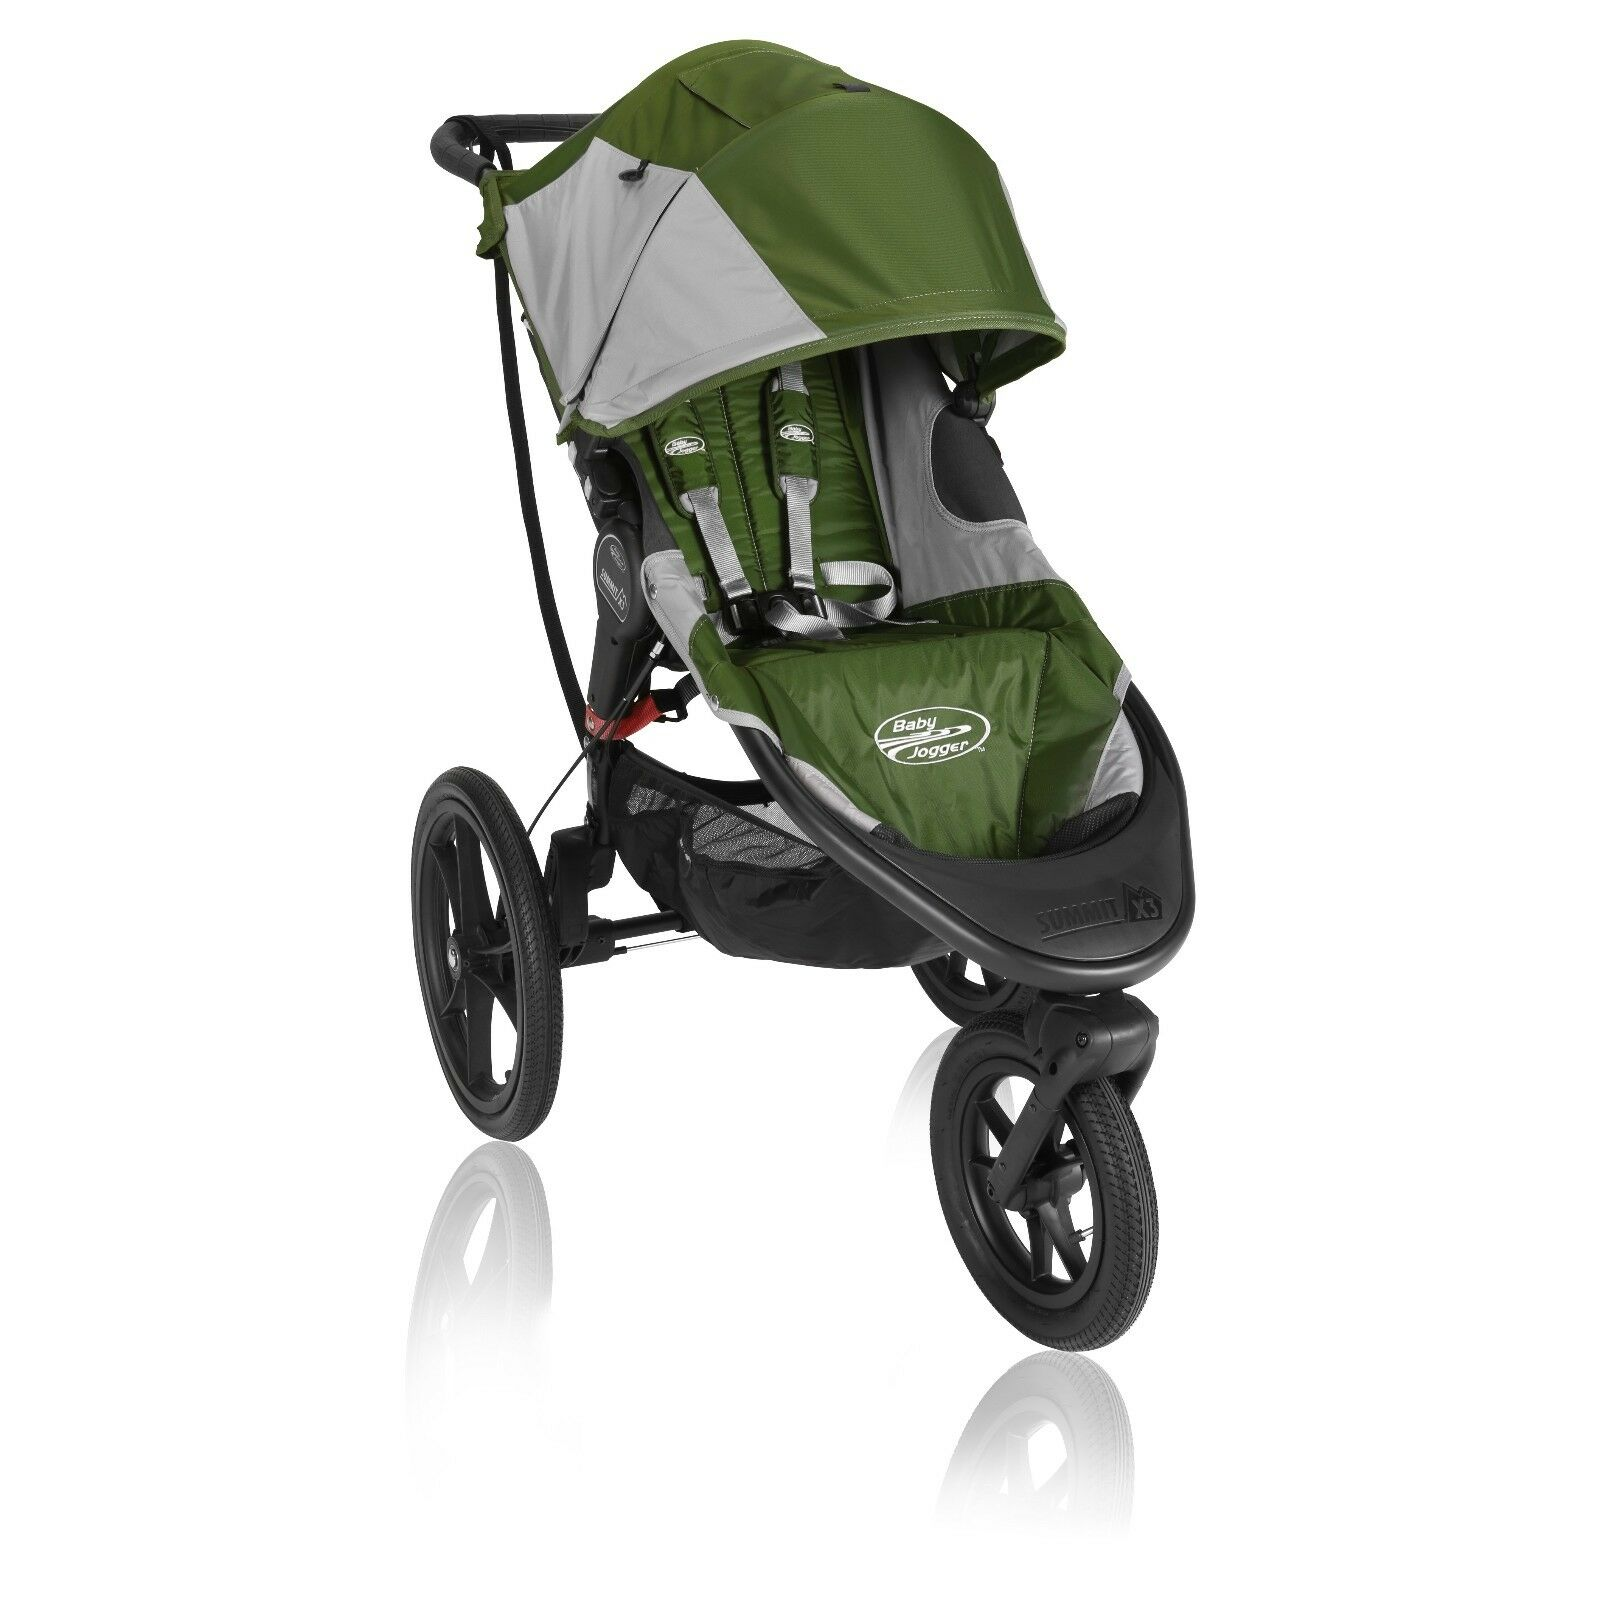 NIB Baby Jogger BJ31440 Summit X3 Simple Stroller Green & Gr